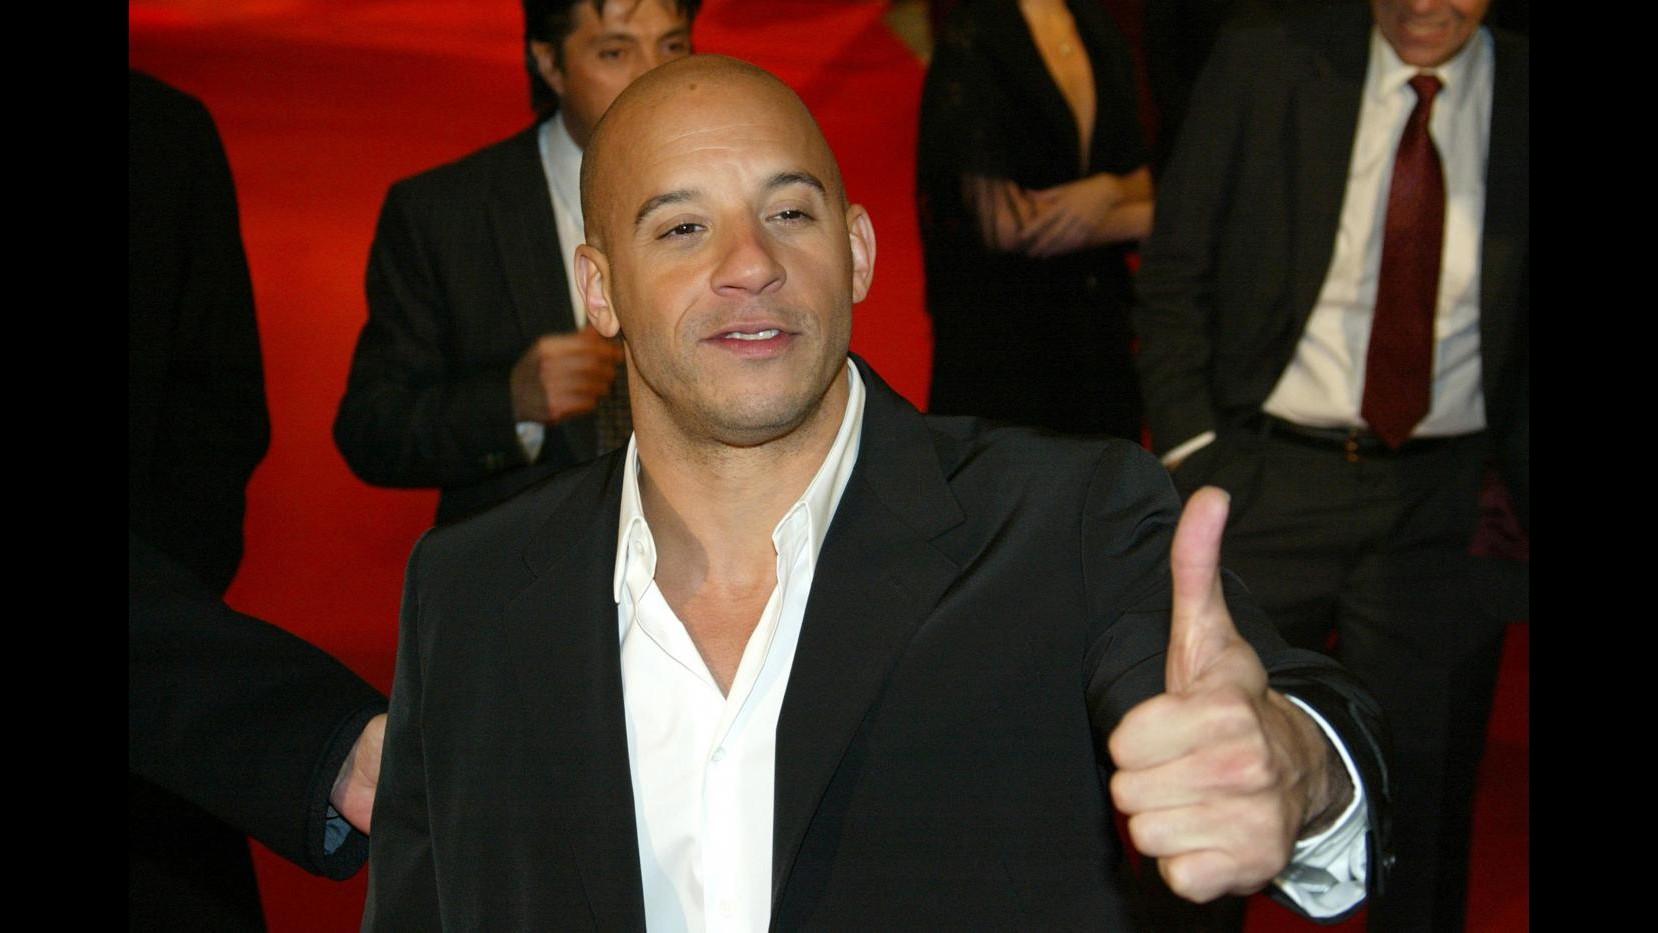 'Chronicles of Riddick 3' in sala nel 2013, Vin Diesel parla di 4 e 5